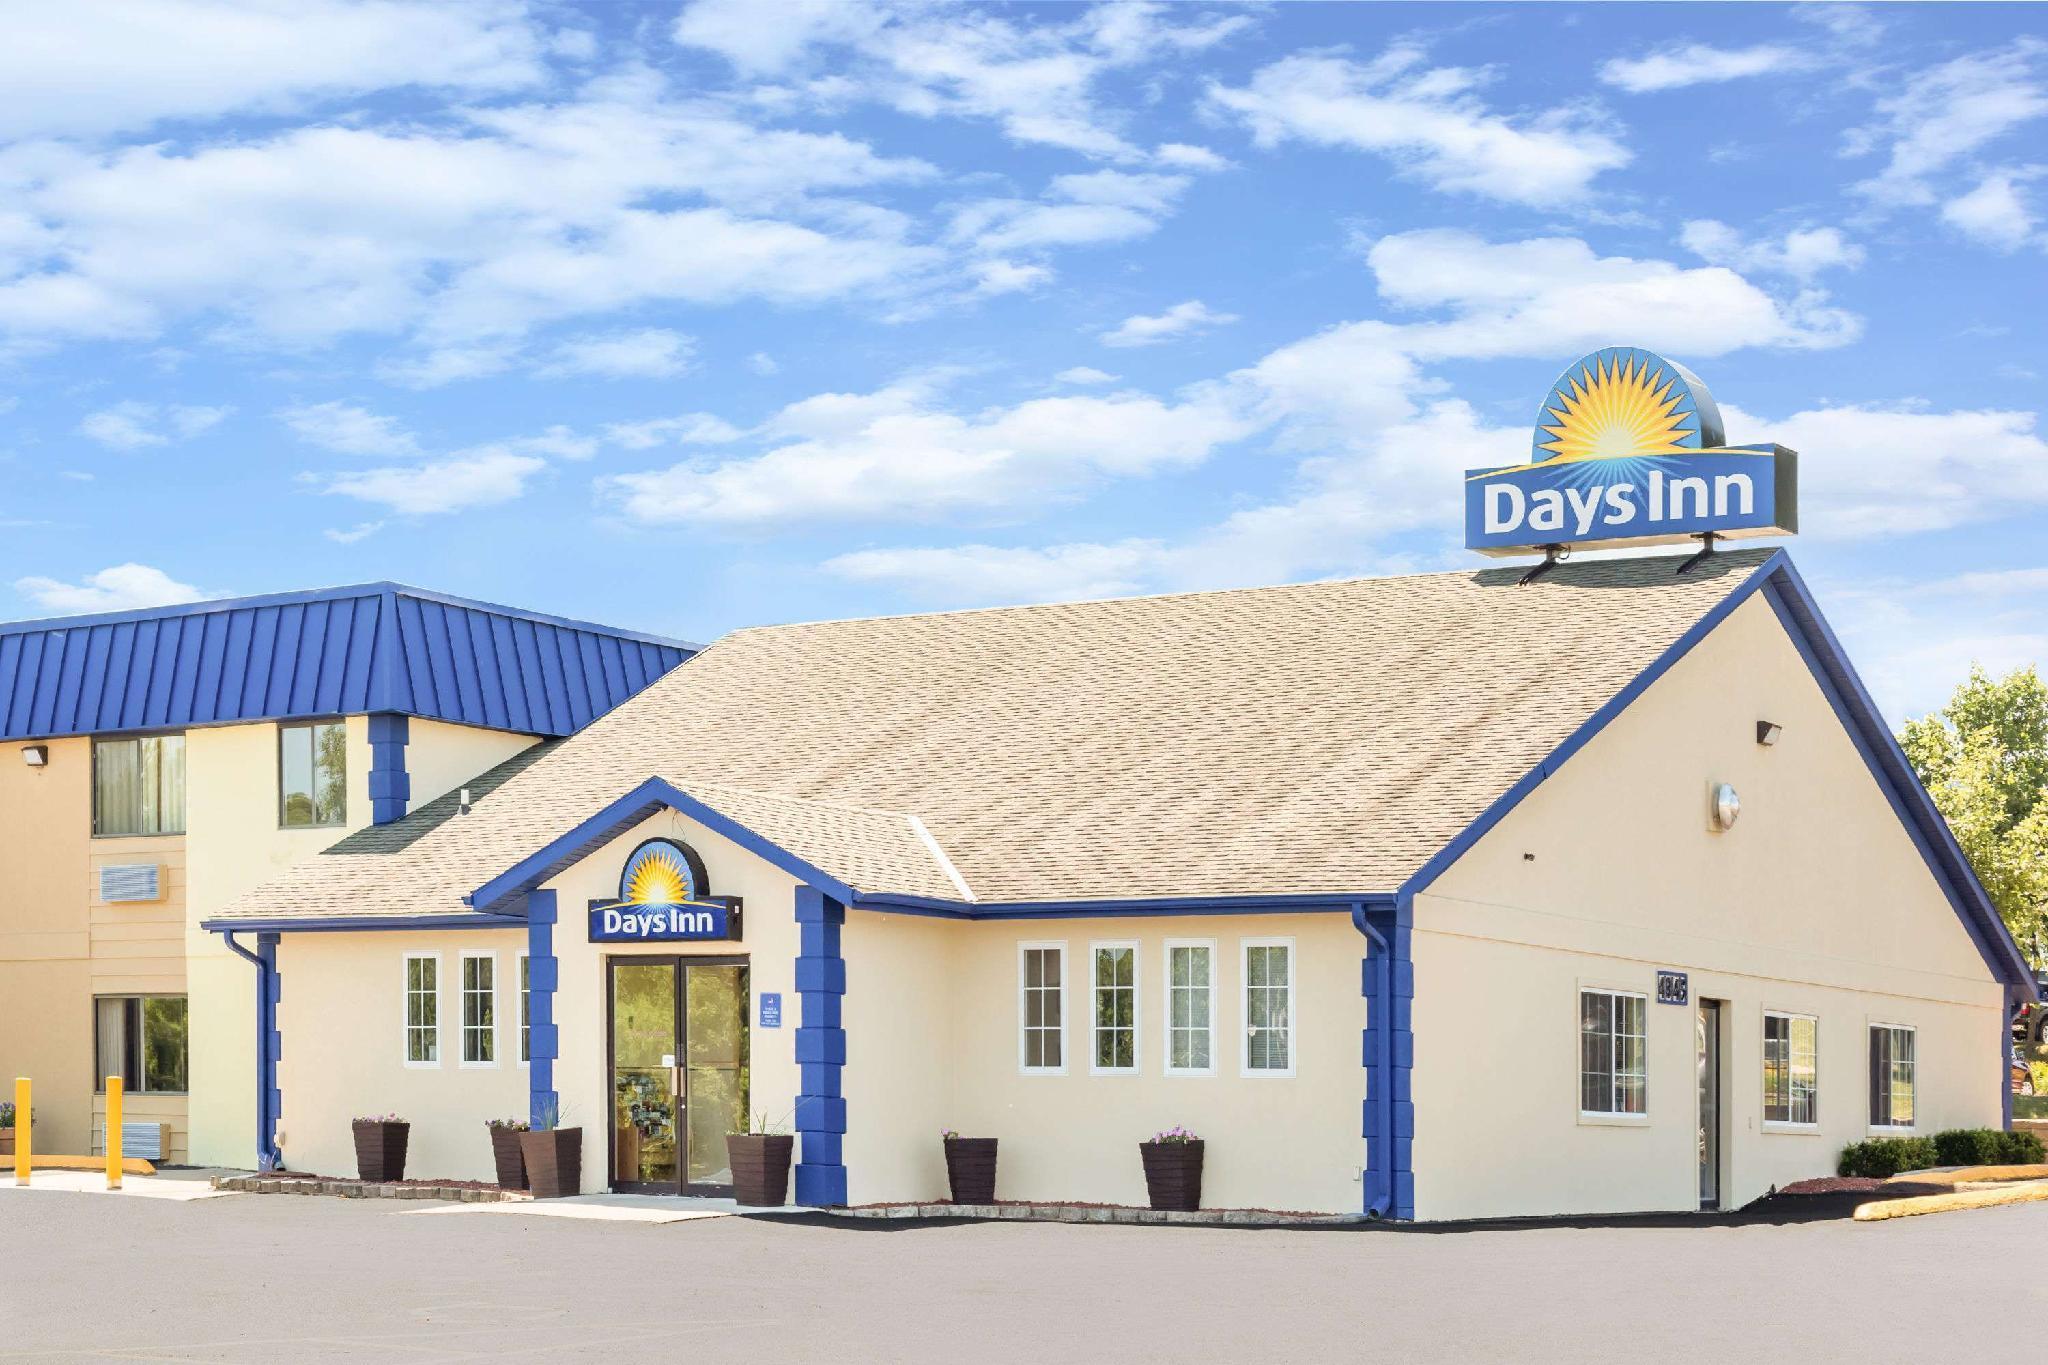 Days Inn By Wyndham Des Moines Merle Hay